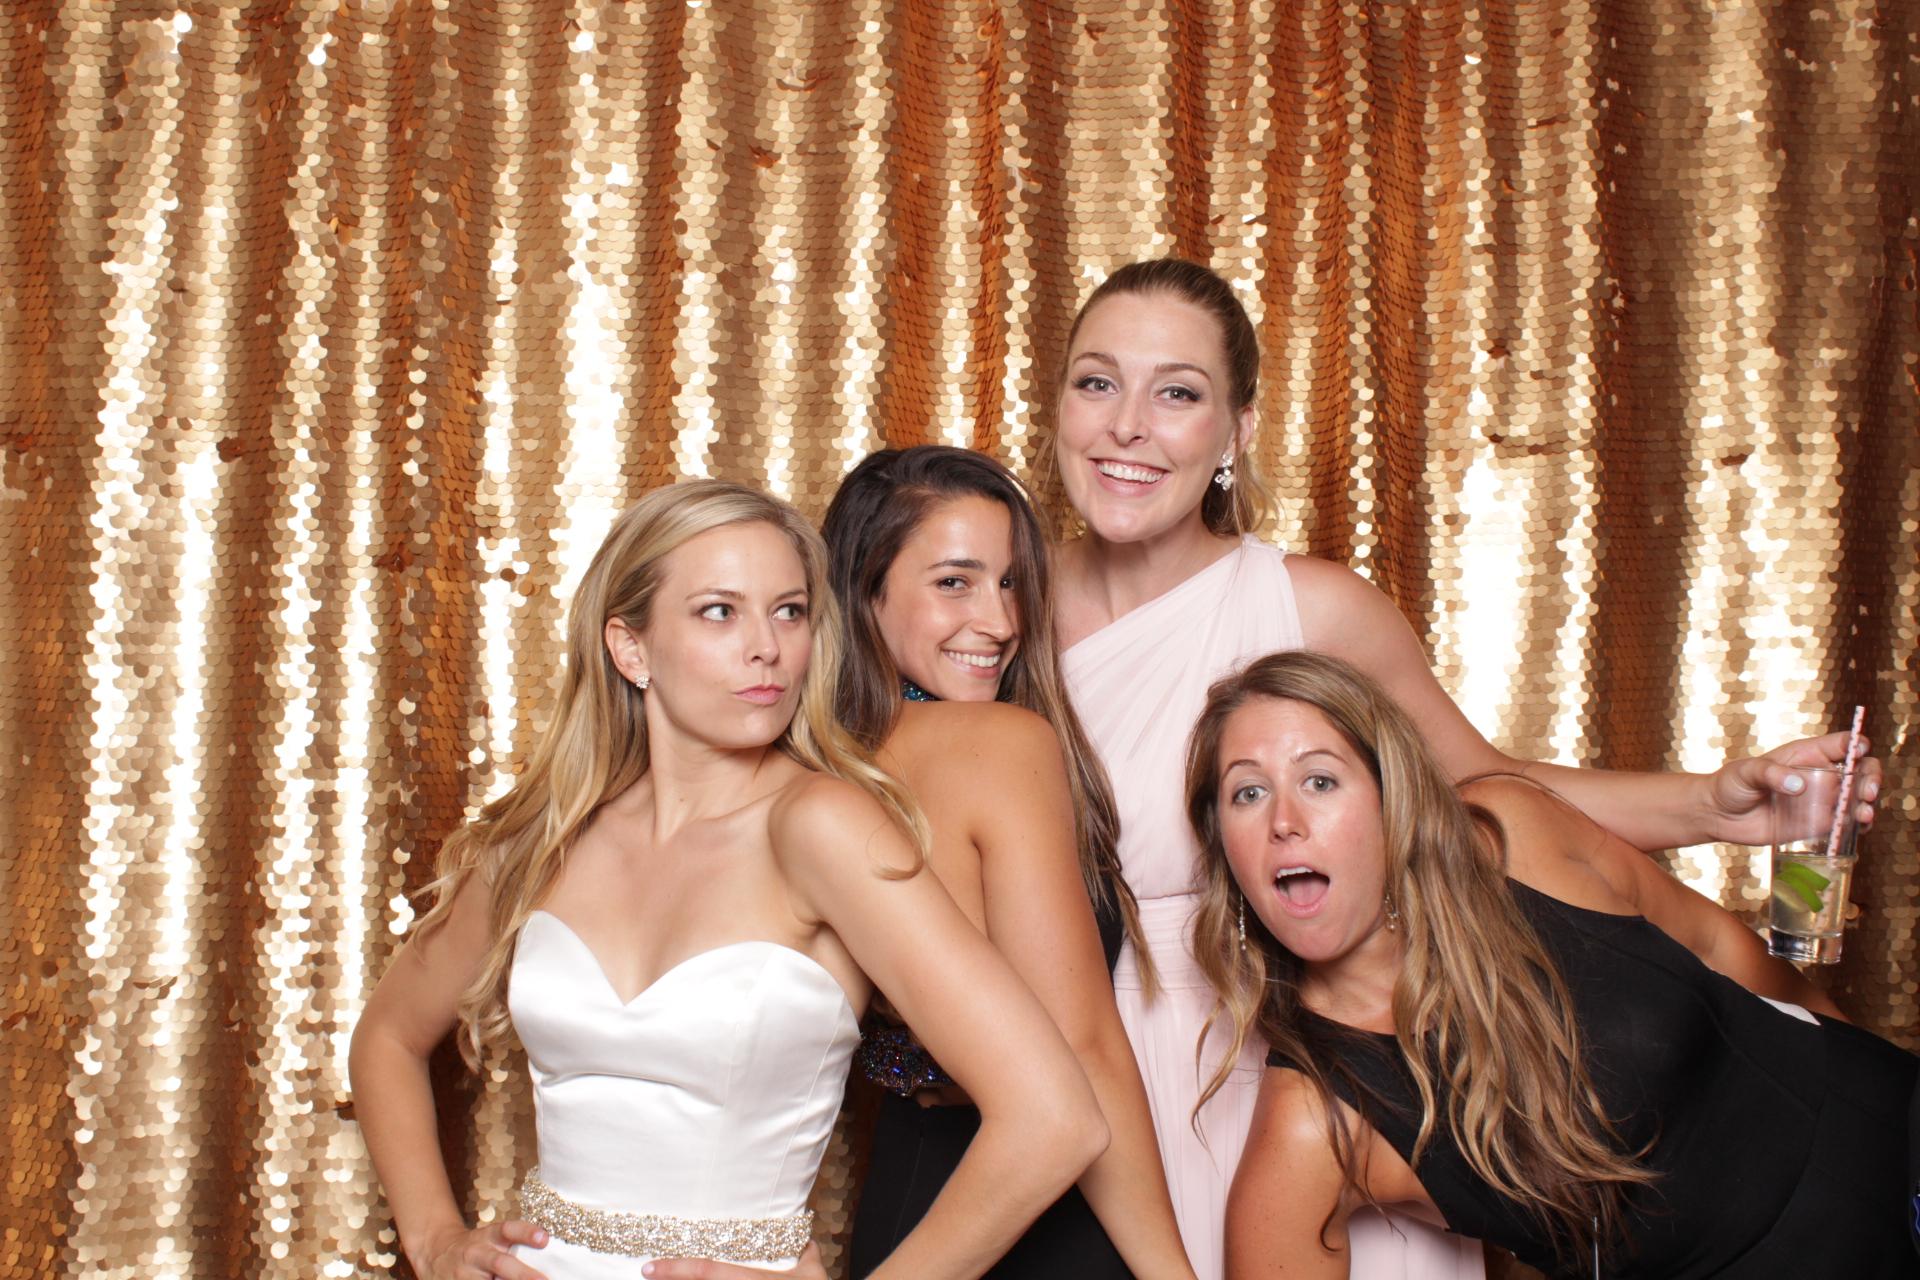 Minneapolis_wedding_photo_booth_Machine_Shop (1).jpg